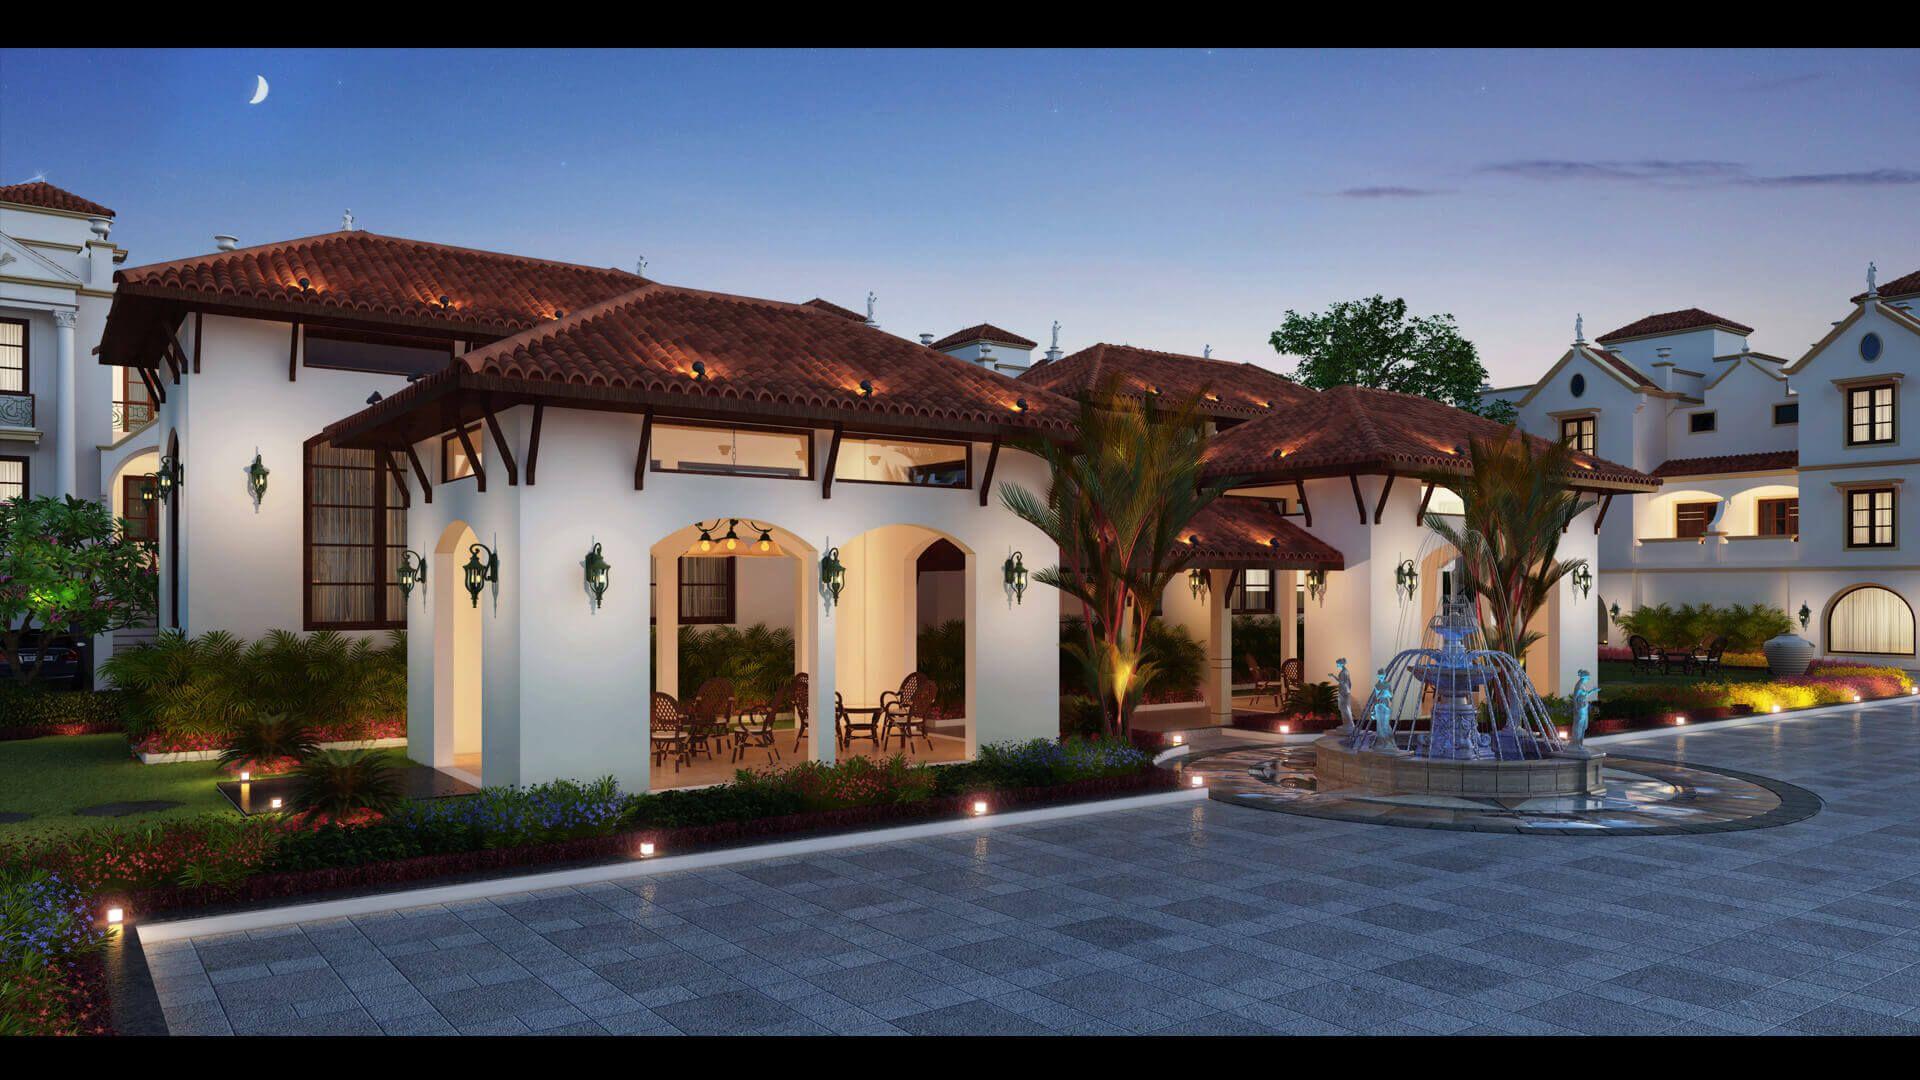 Exterior: 3d House Exterior Night View Design